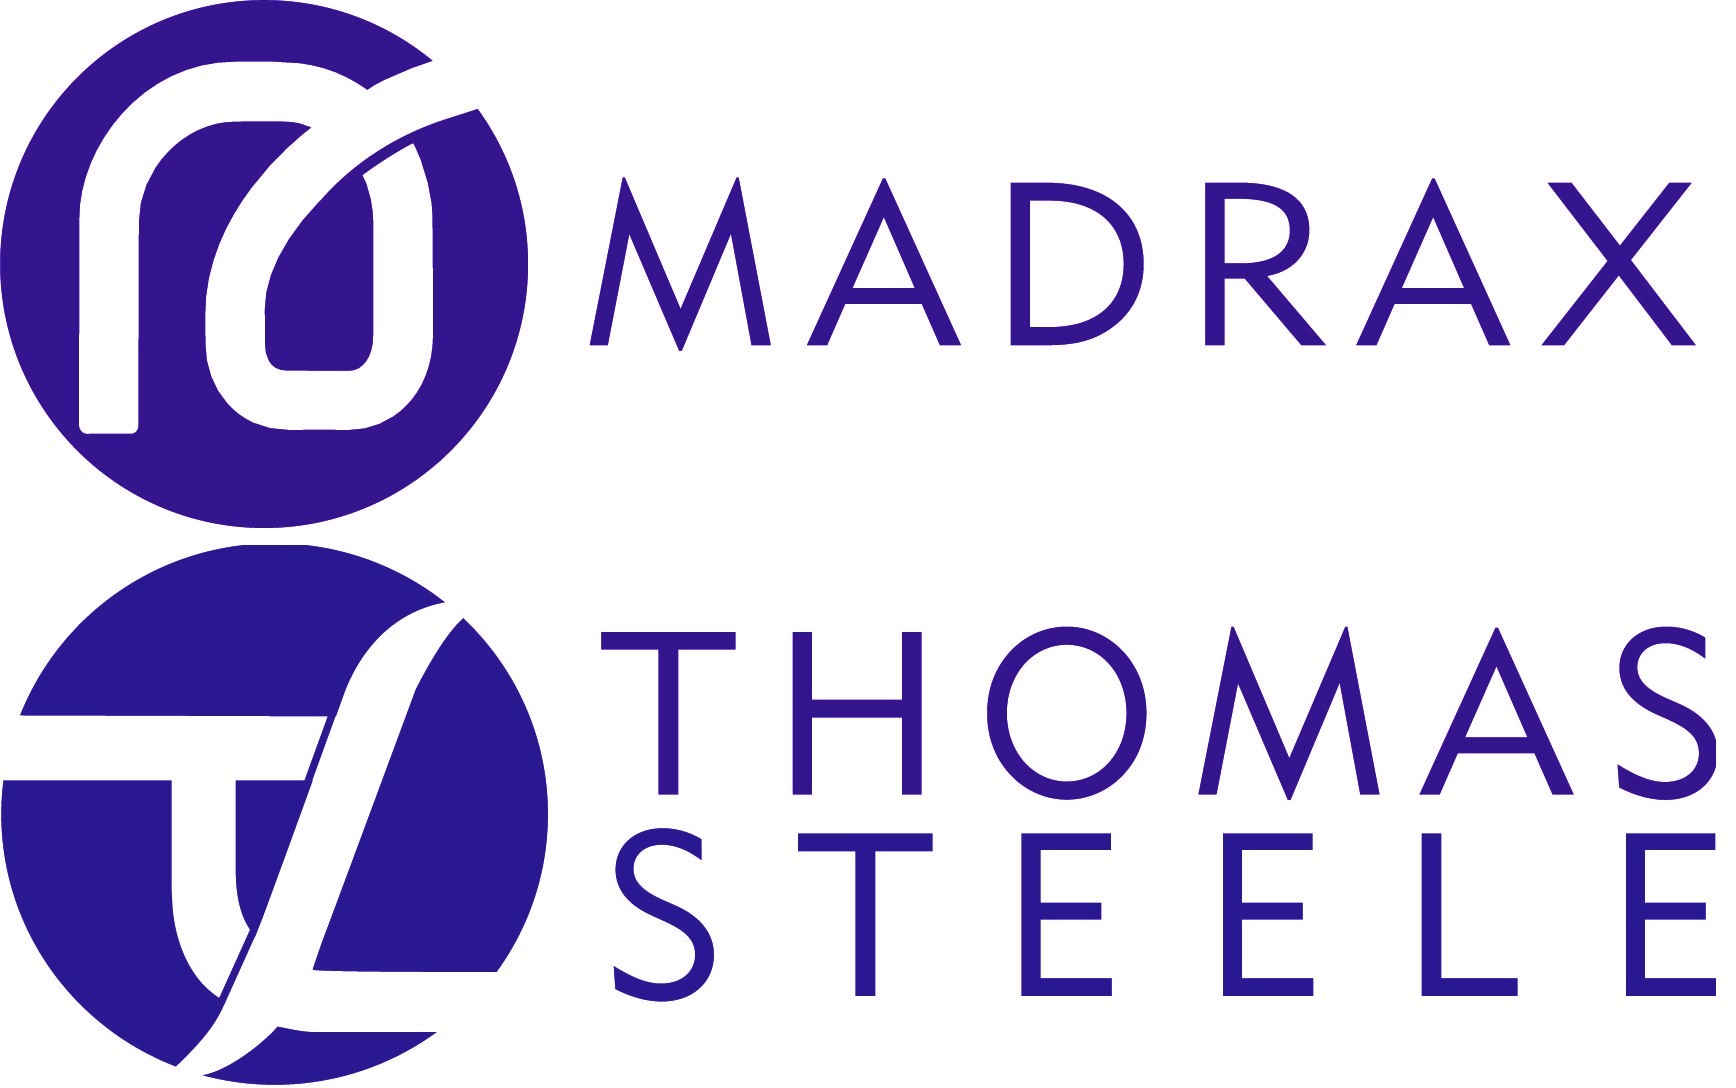 Madrax - Thomas Steele logo